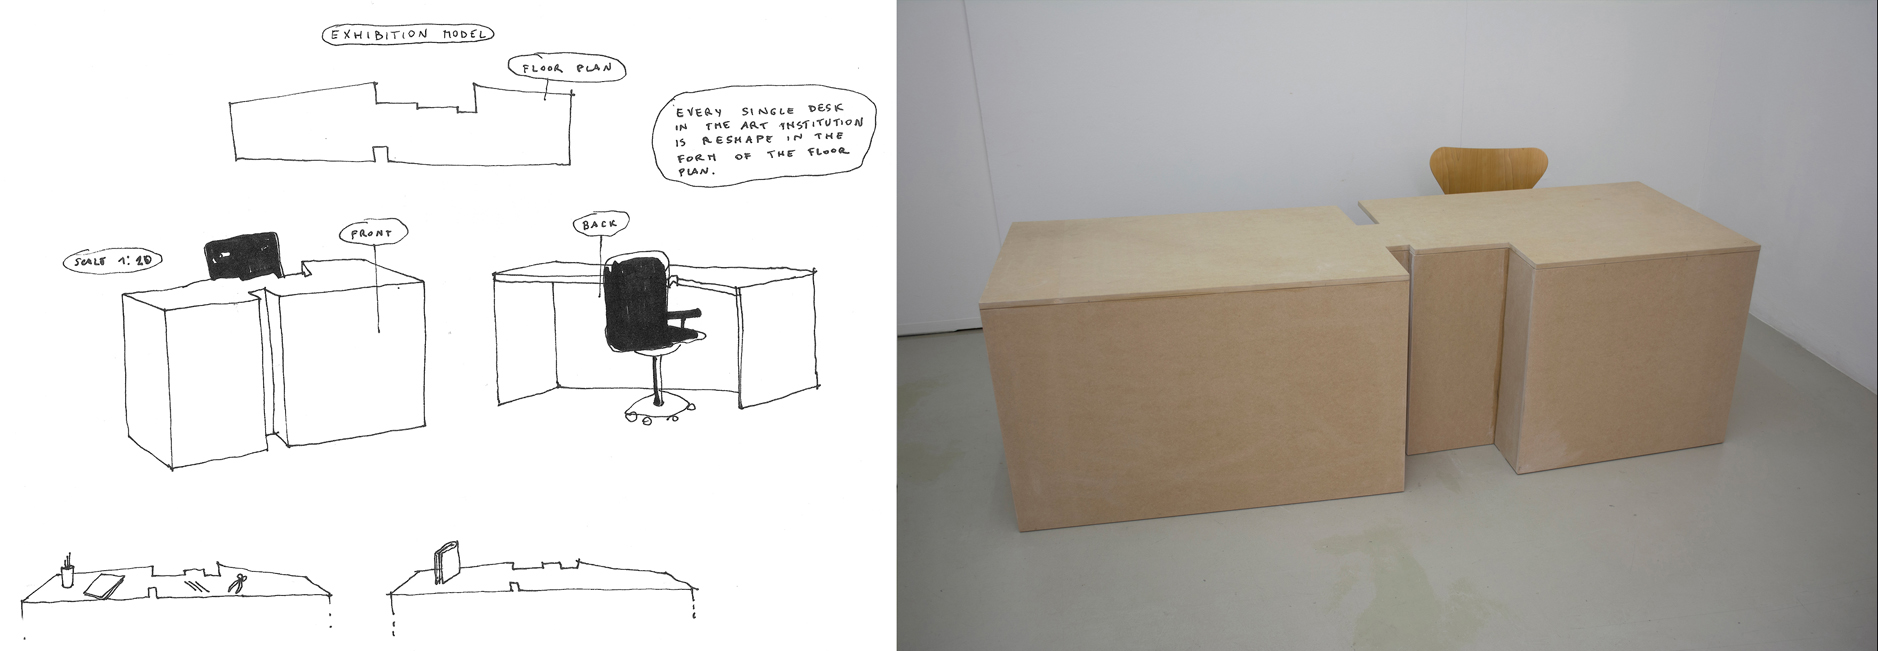 spatial-disposition-small-exhibition-modell-aldo-giannotti.jpg